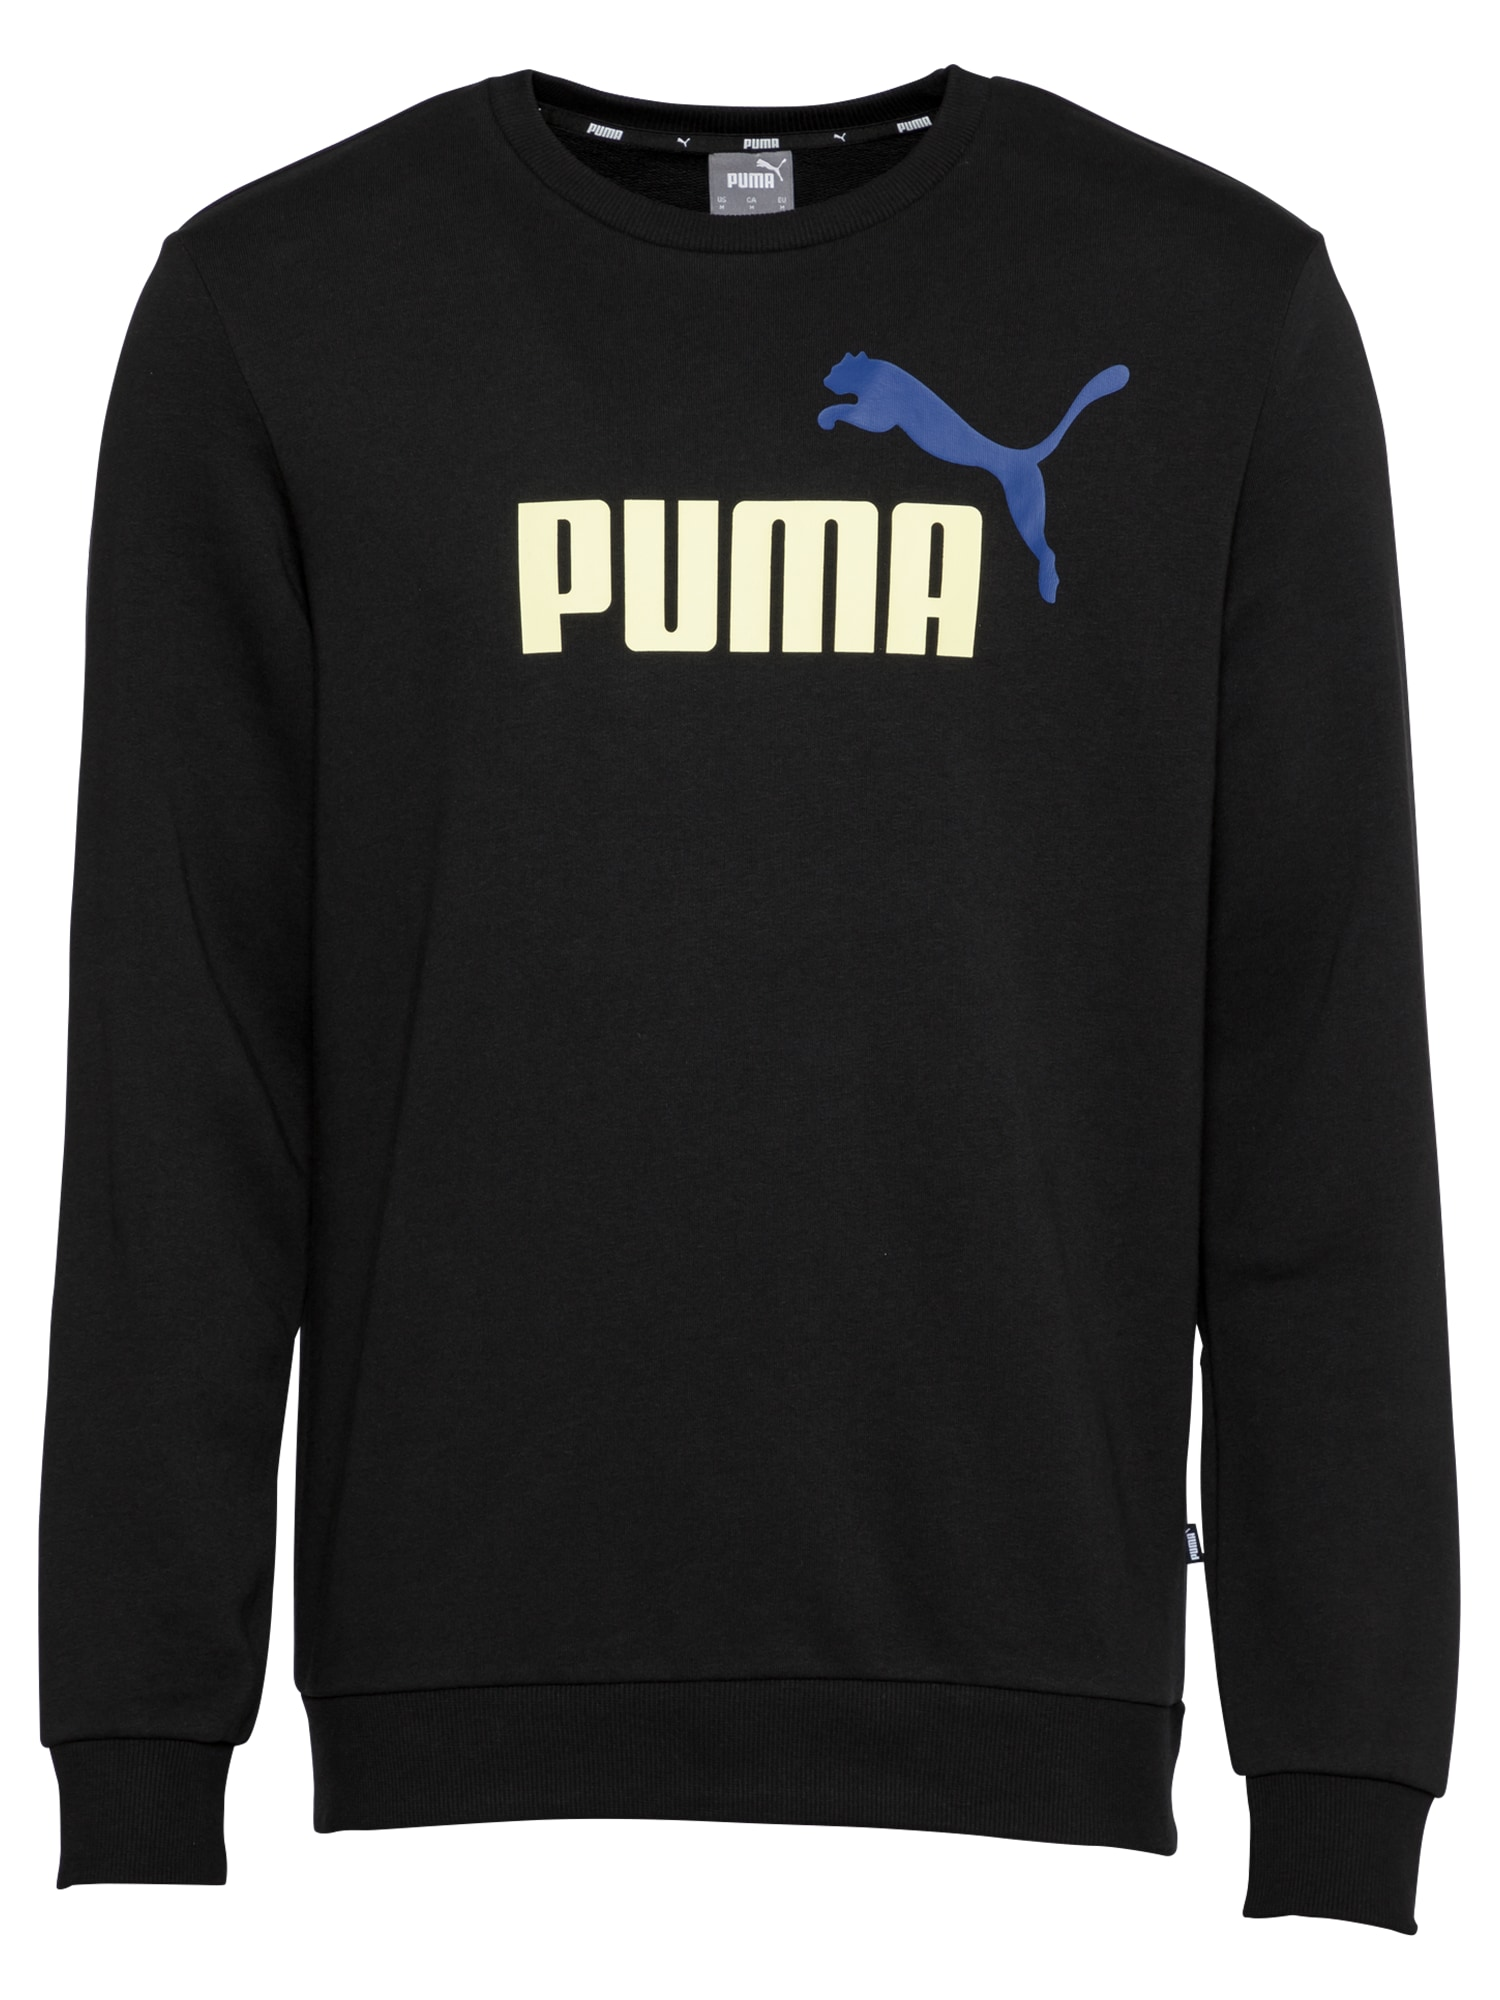 "PUMA Sportinio tipo megztinis juoda / balta / sodri mėlyna (""karališka"")"